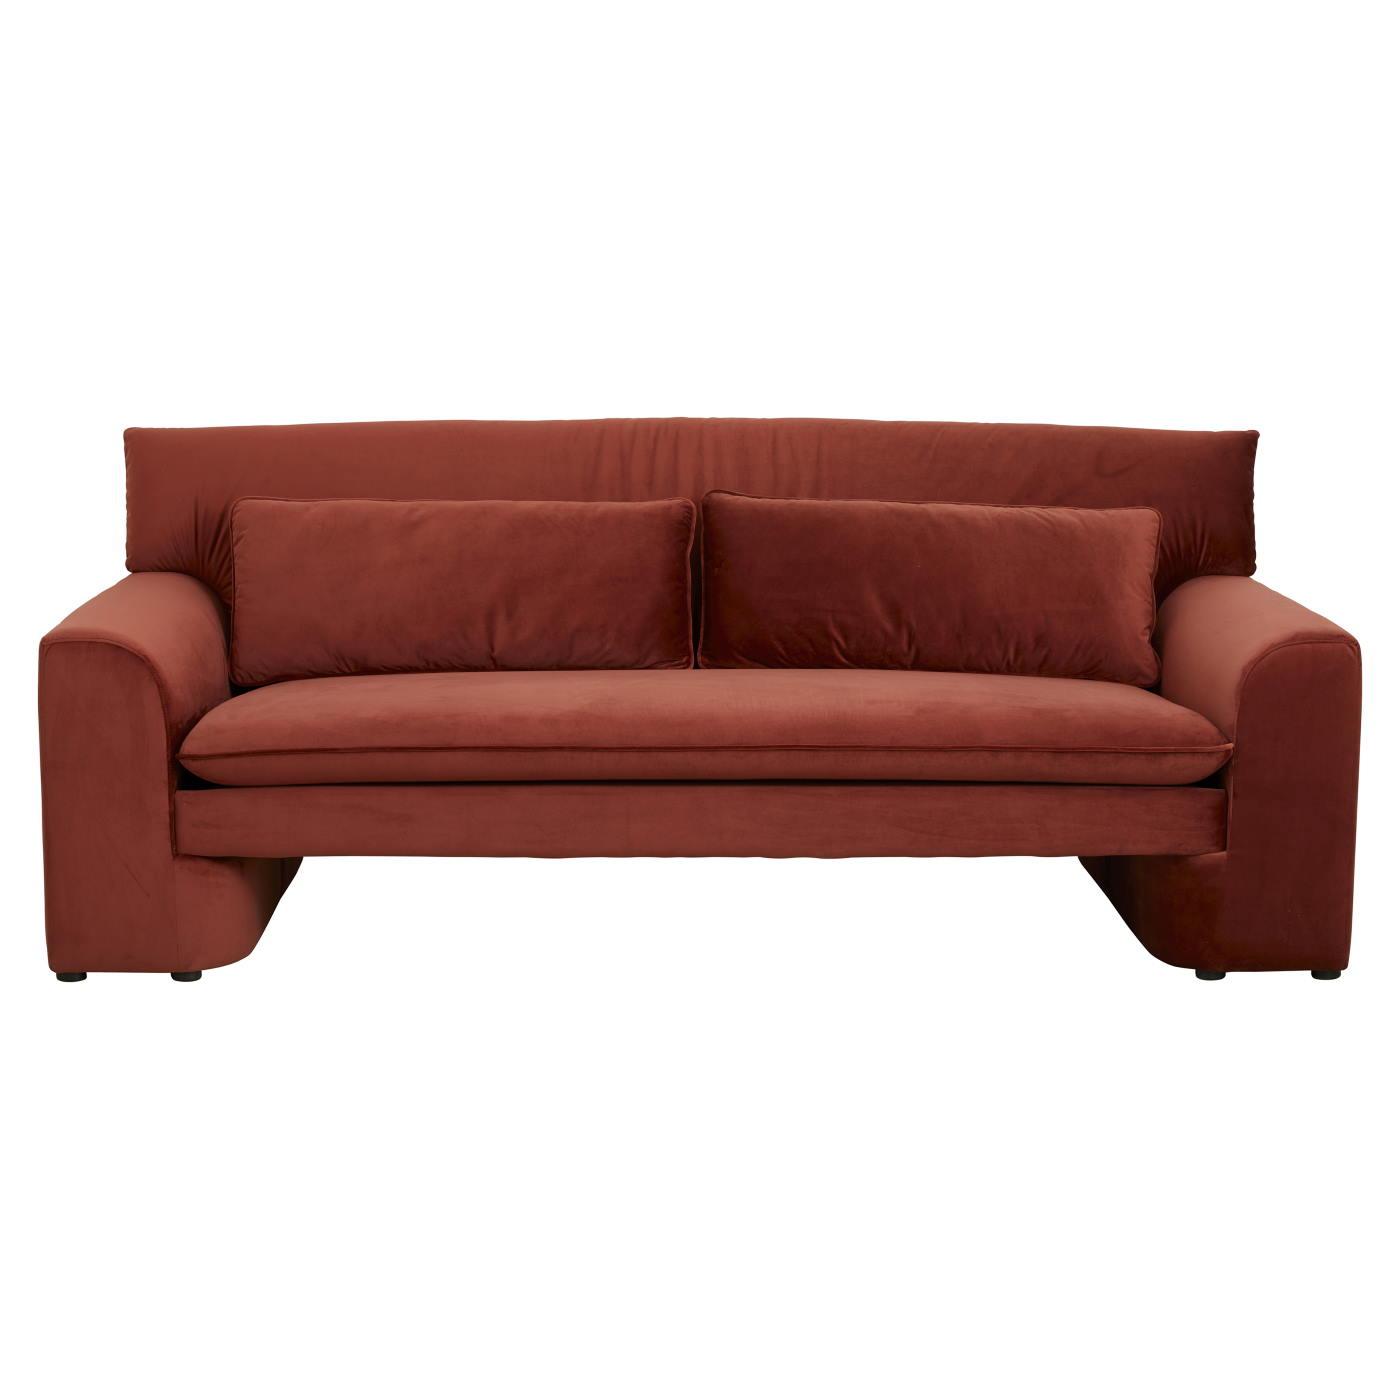 Soffa röd sammet GEO Nordal